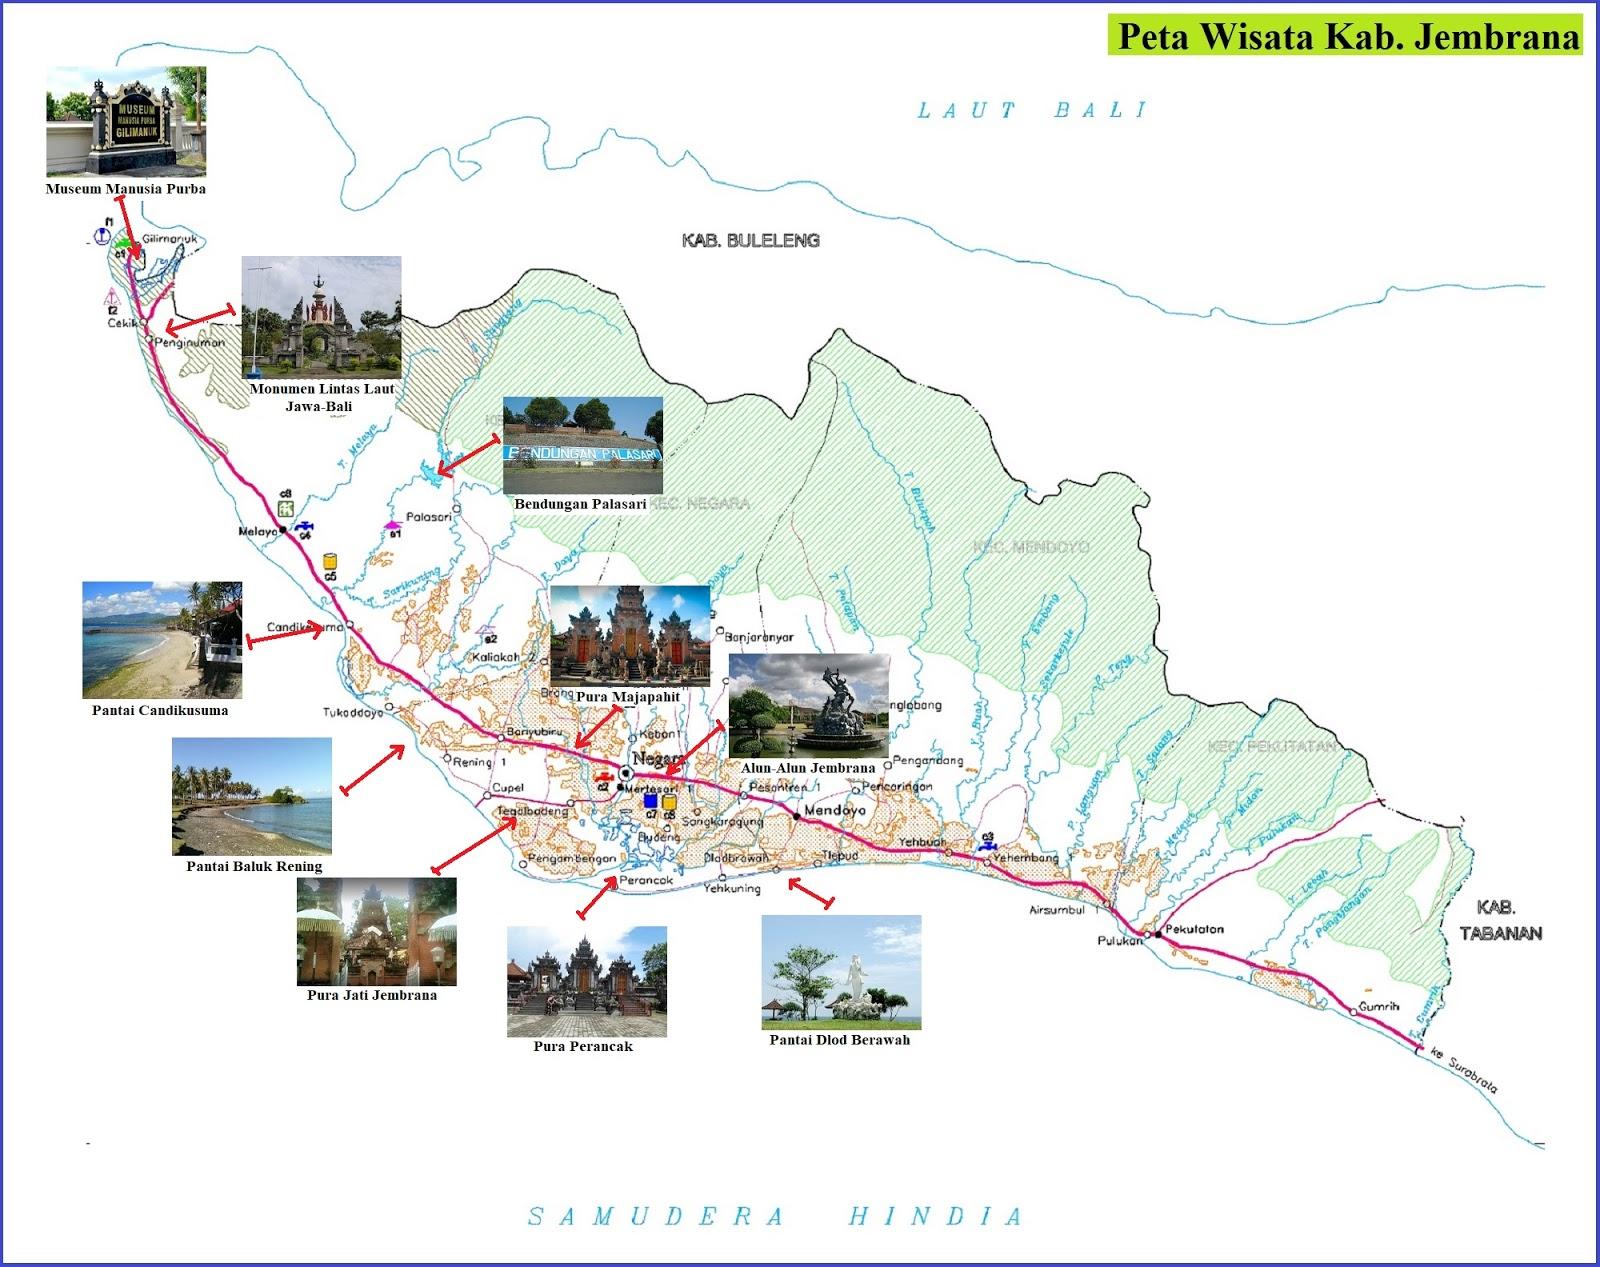 Peta Wisata Kabupaten Jembrana